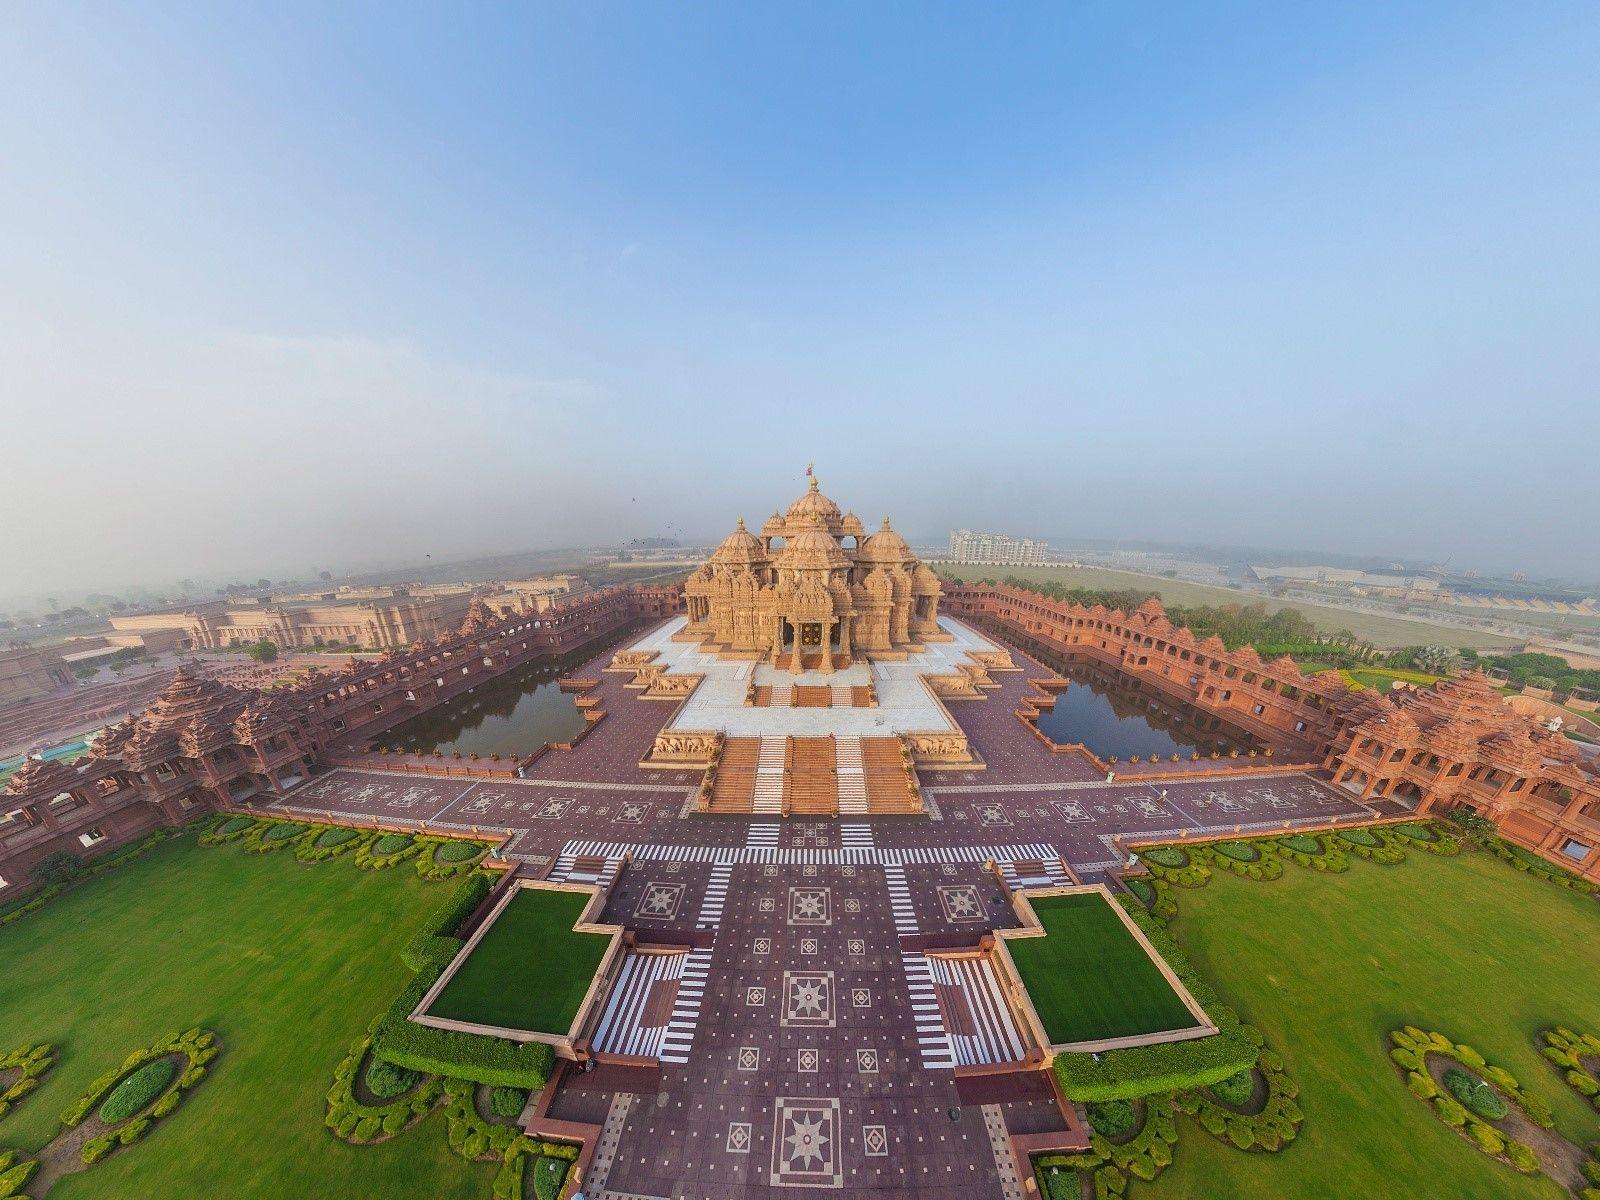 Swaminarayan Akshardham Temple Hindou A Delhi Hd Wallpapers Hd World Heritage City Tourist Places Hindu Temple